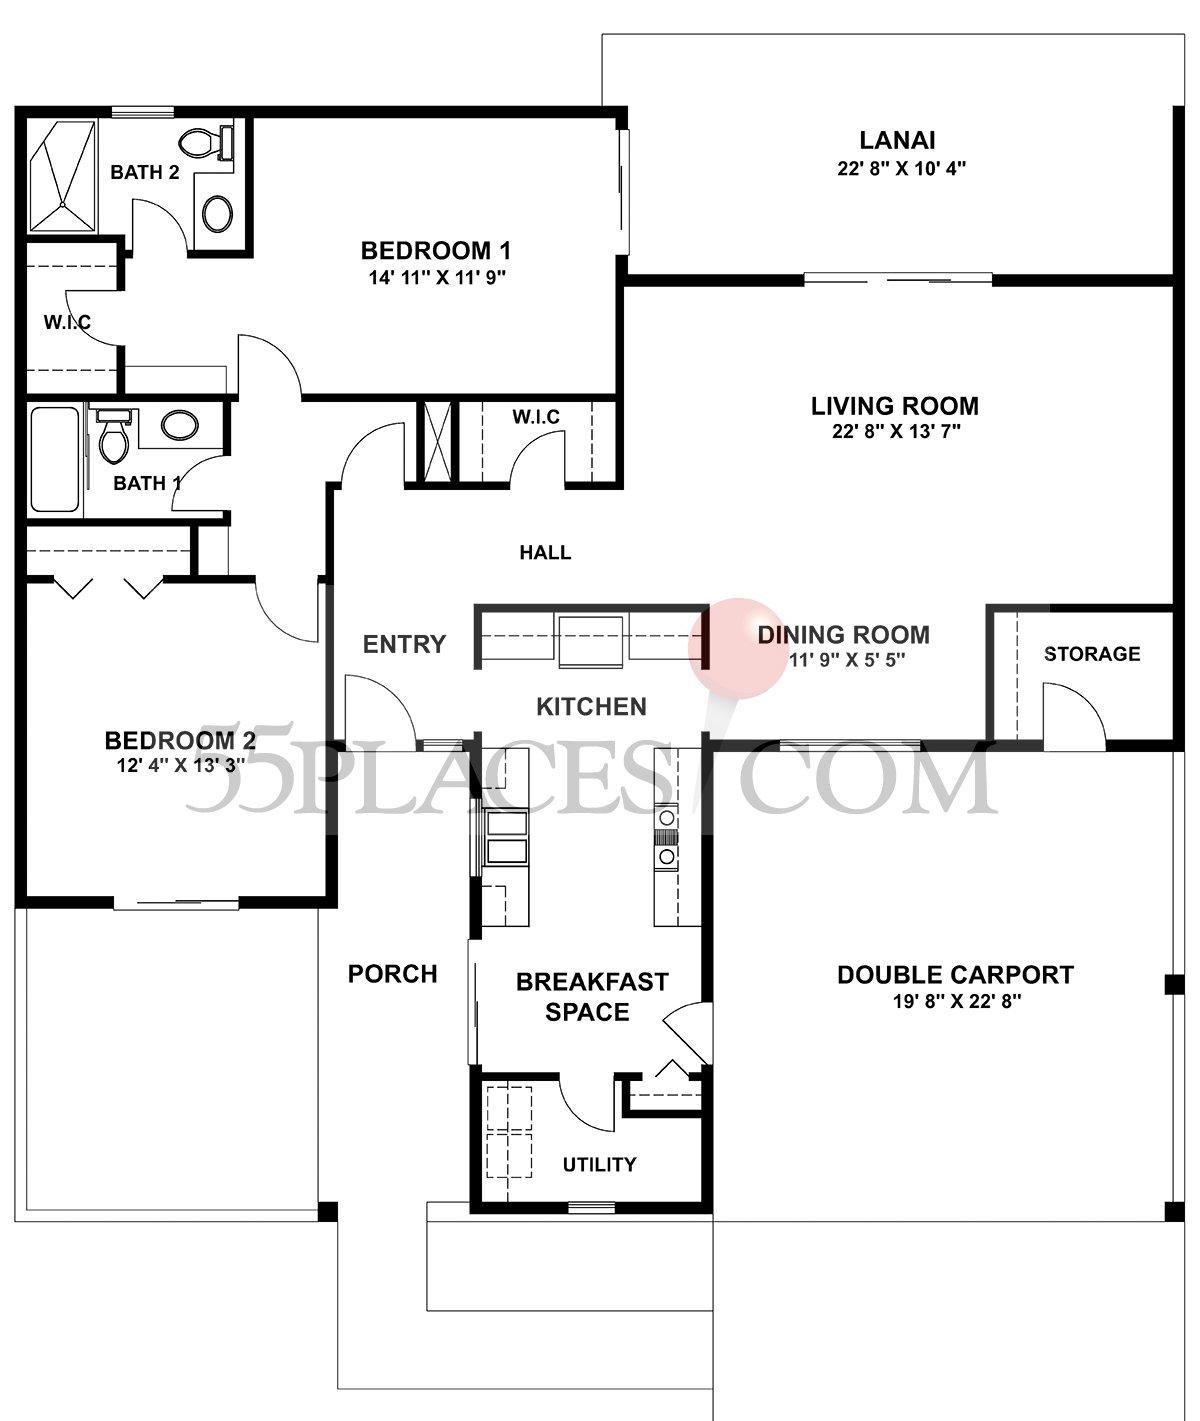 Duplex (A-23)